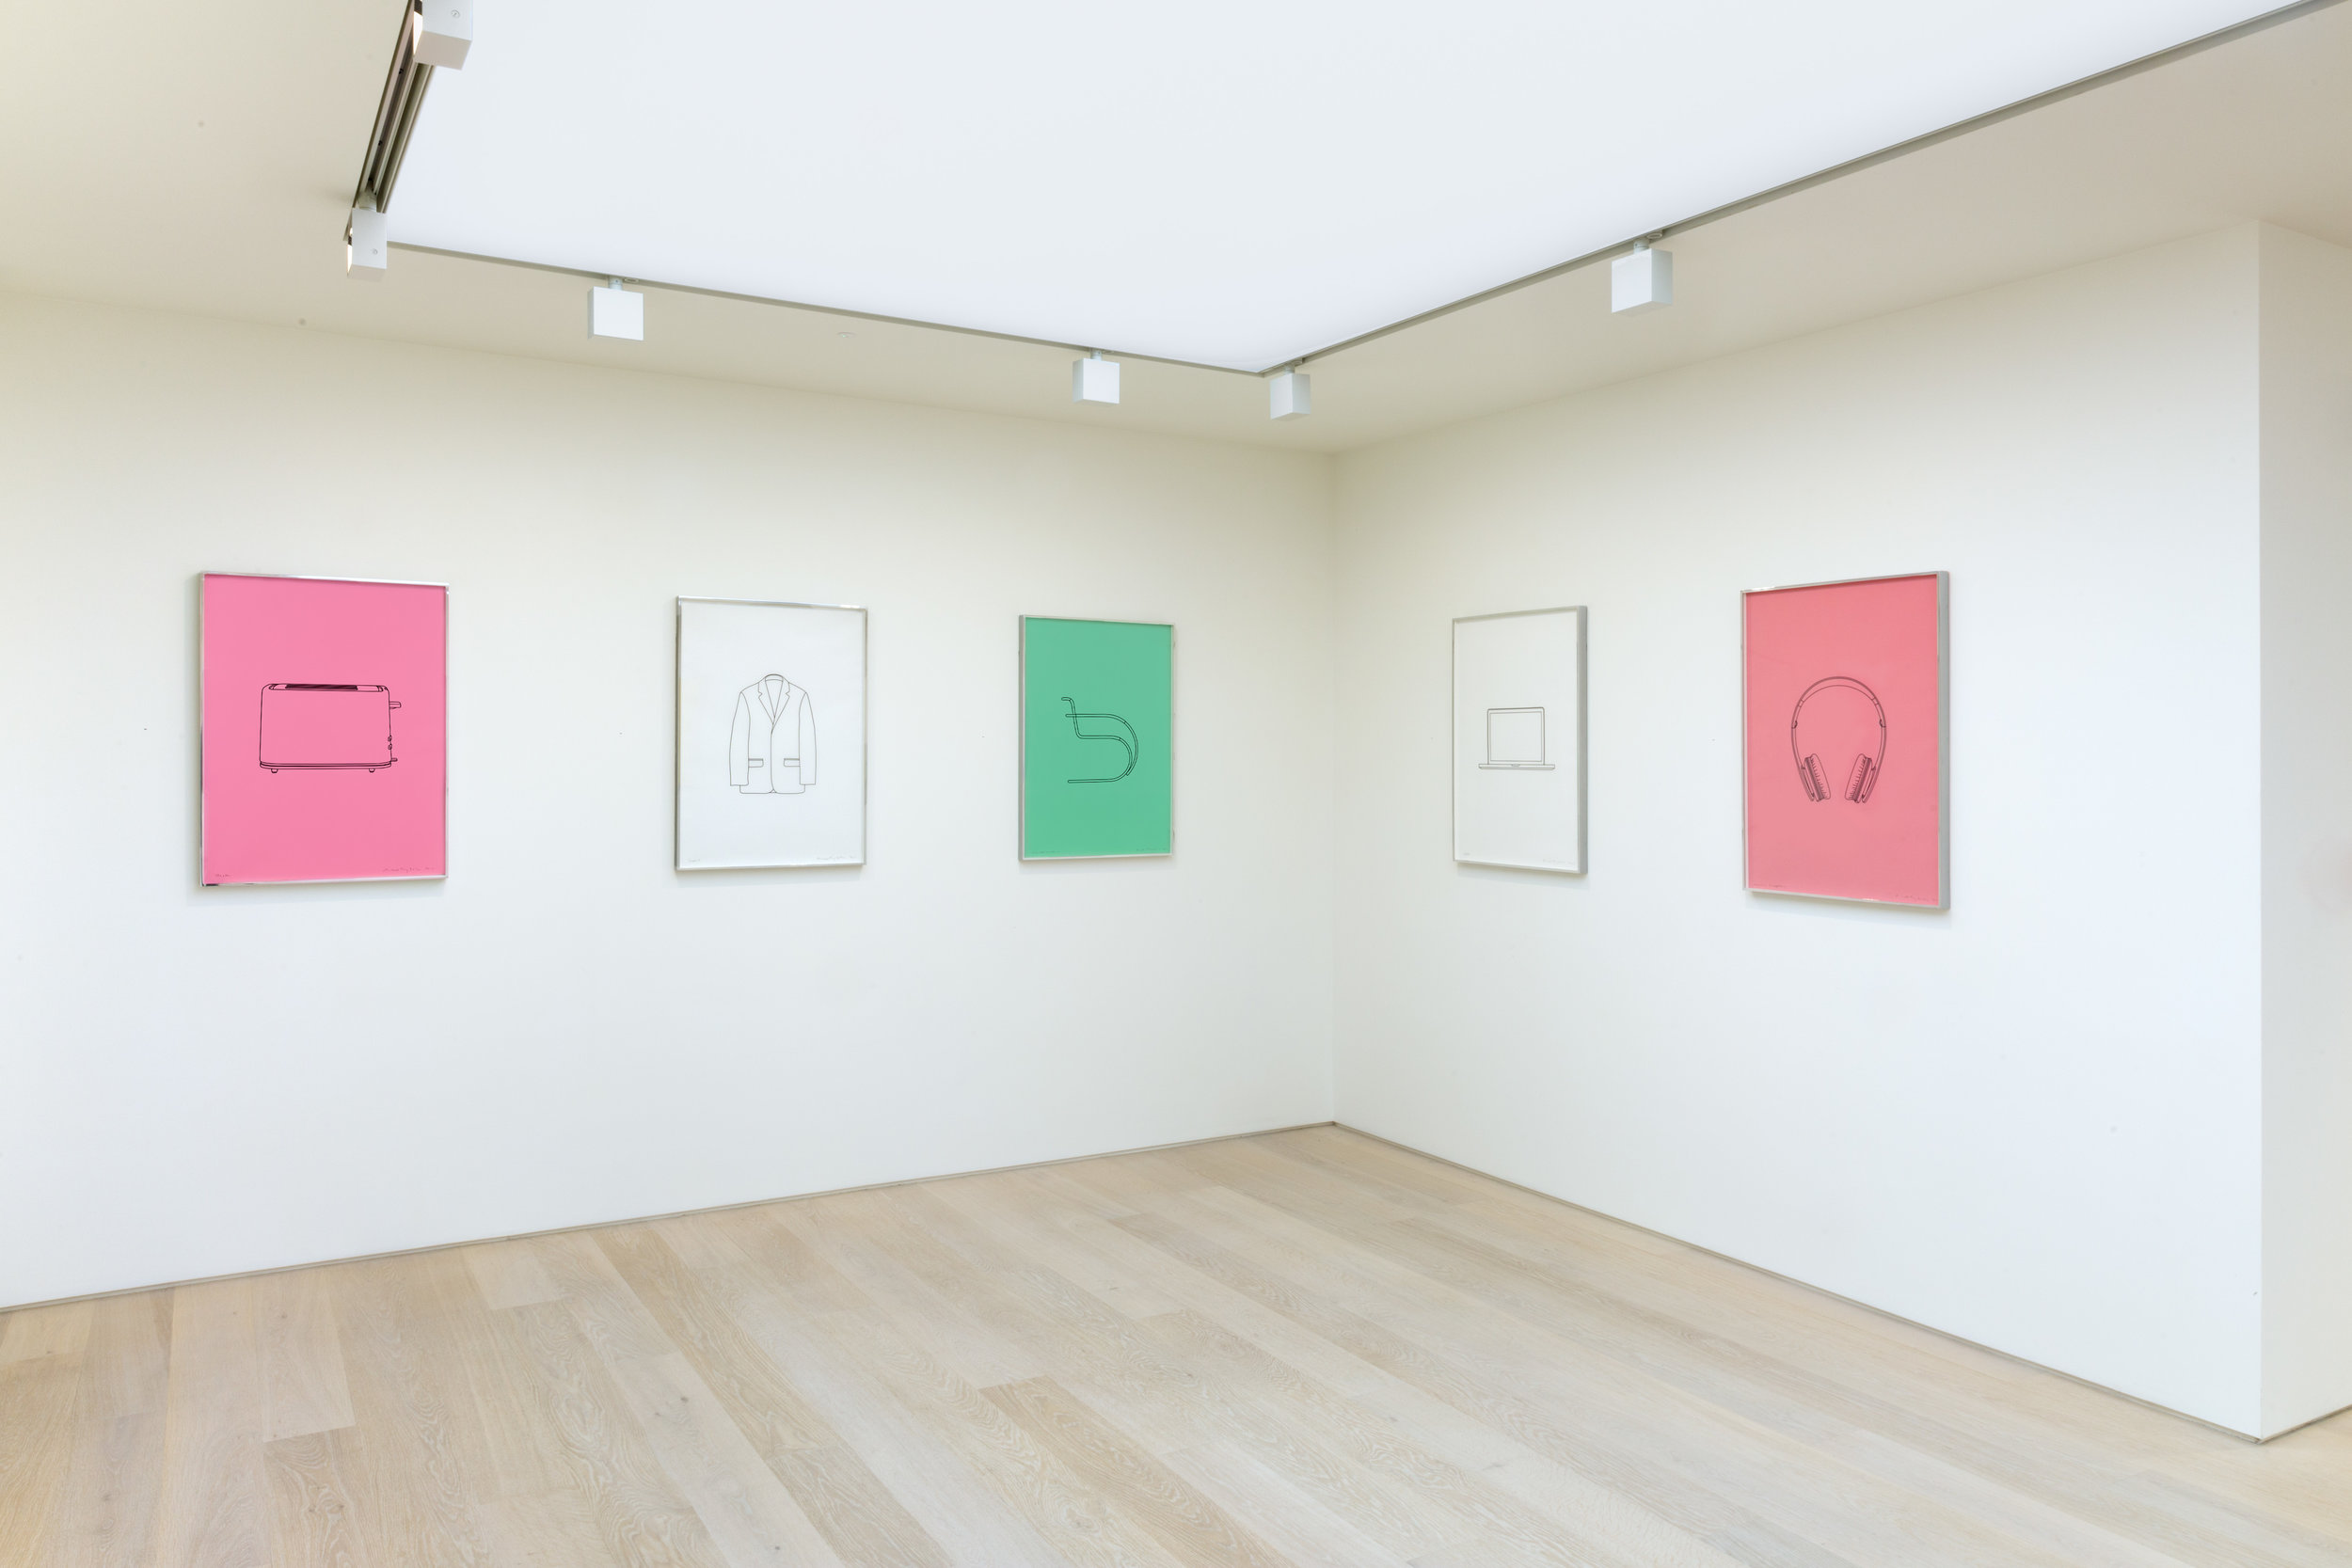 Michael Craig-Martin Quotidian_Alan Cristea Gallery 2017 installation. Photo FXP Photography (17)~hi.jpg